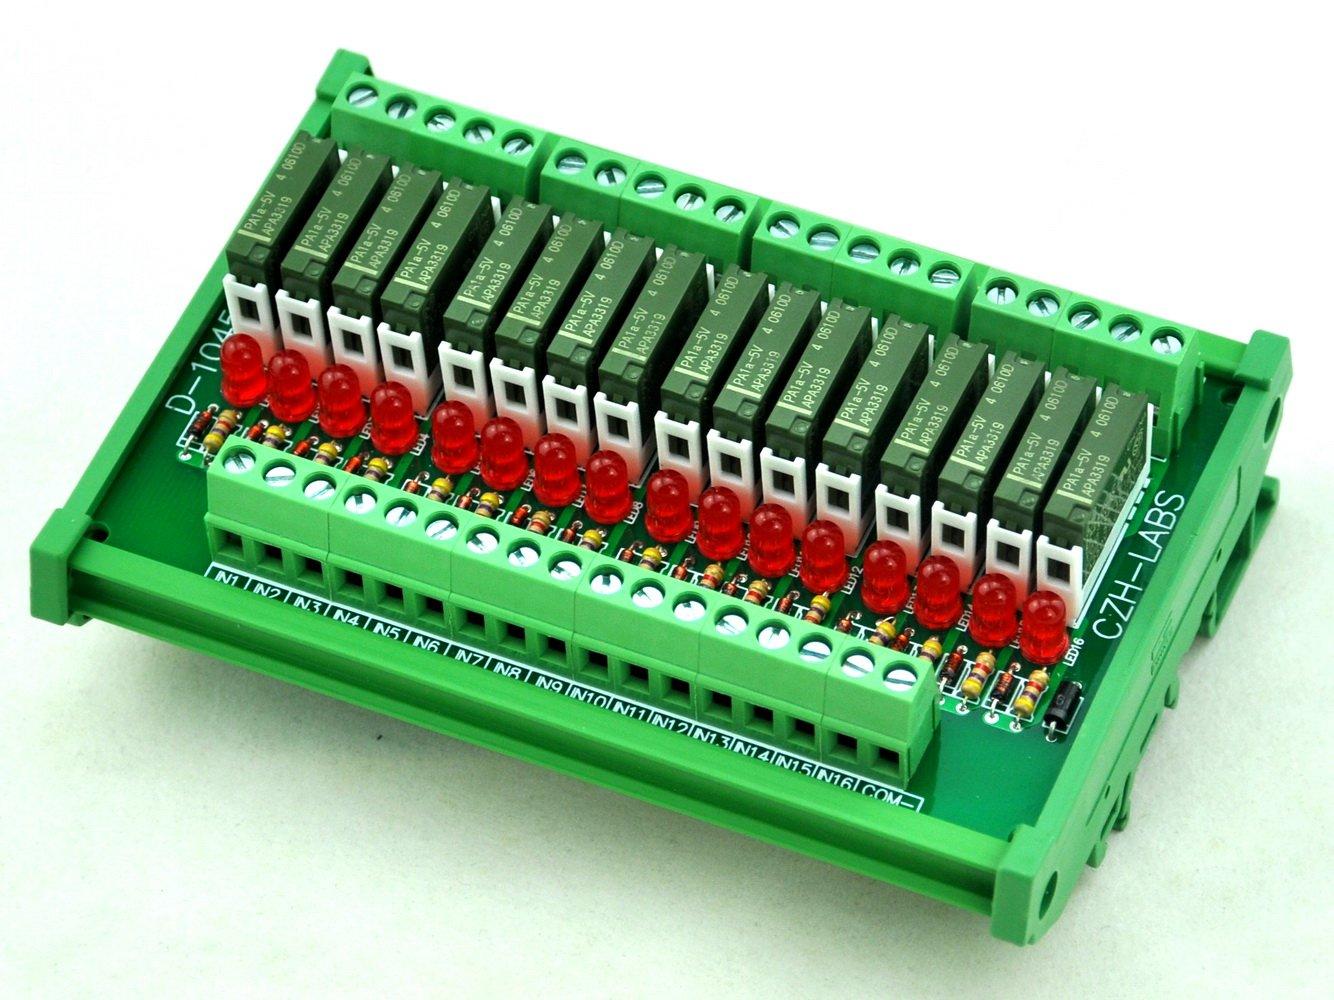 ELECTRONICS-SALON Slim DIN Rail Mount DC5V Source/PNP 16 SPST-NO 5A Power Relay Module, PA1a-5V